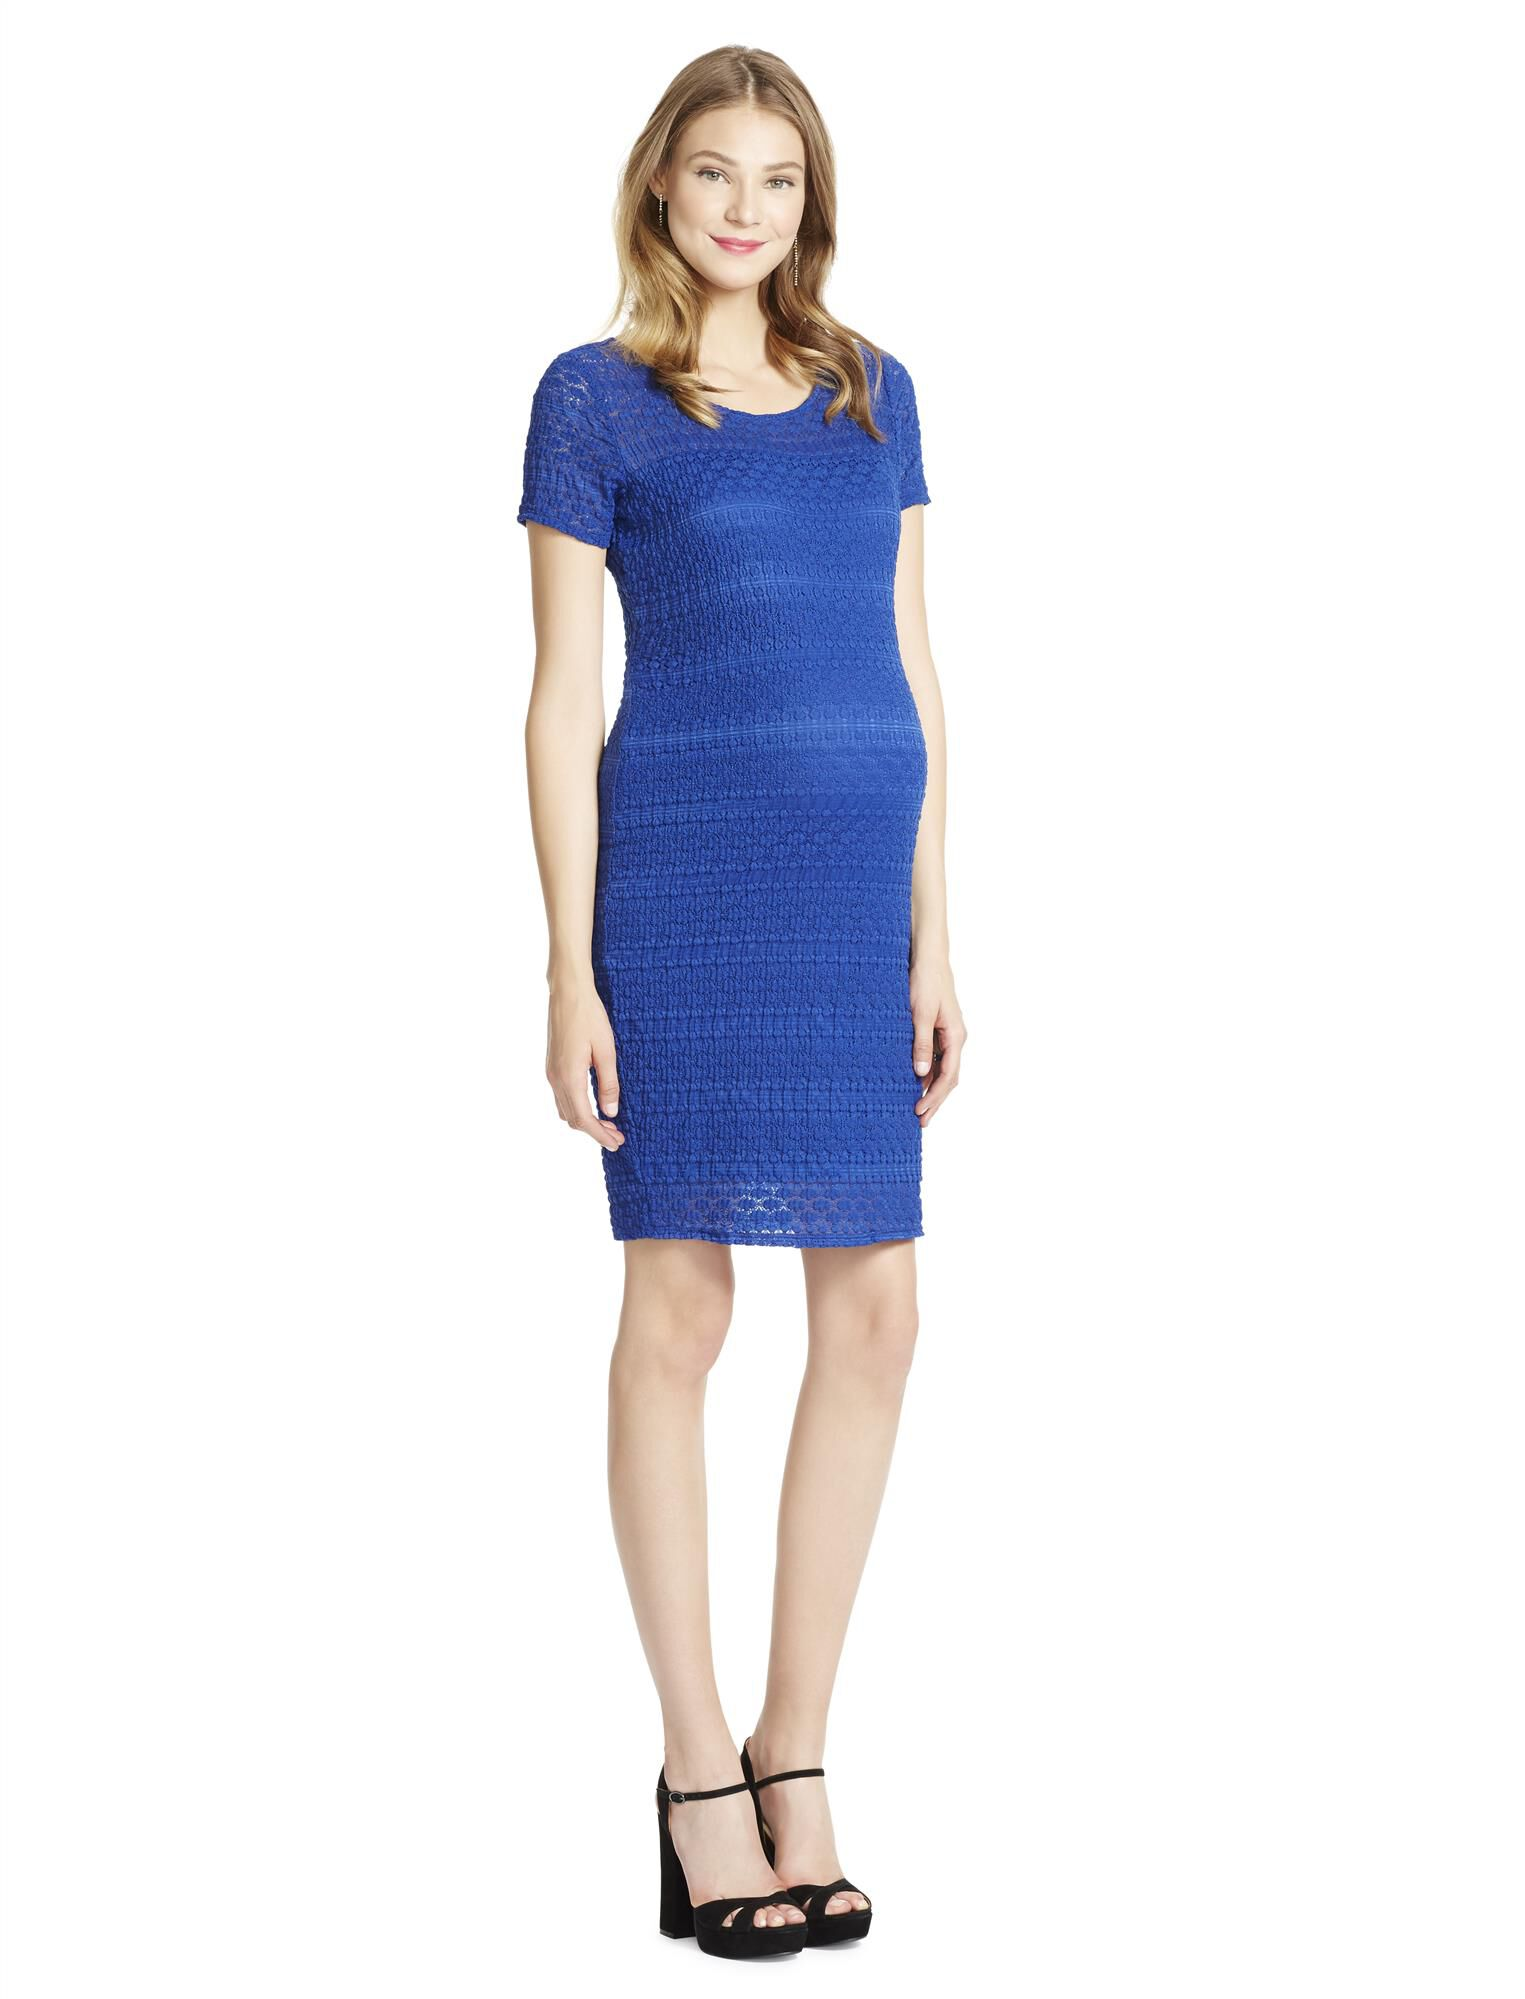 Jessica Simpson Lace Bodycon Maternity Dress- Blue